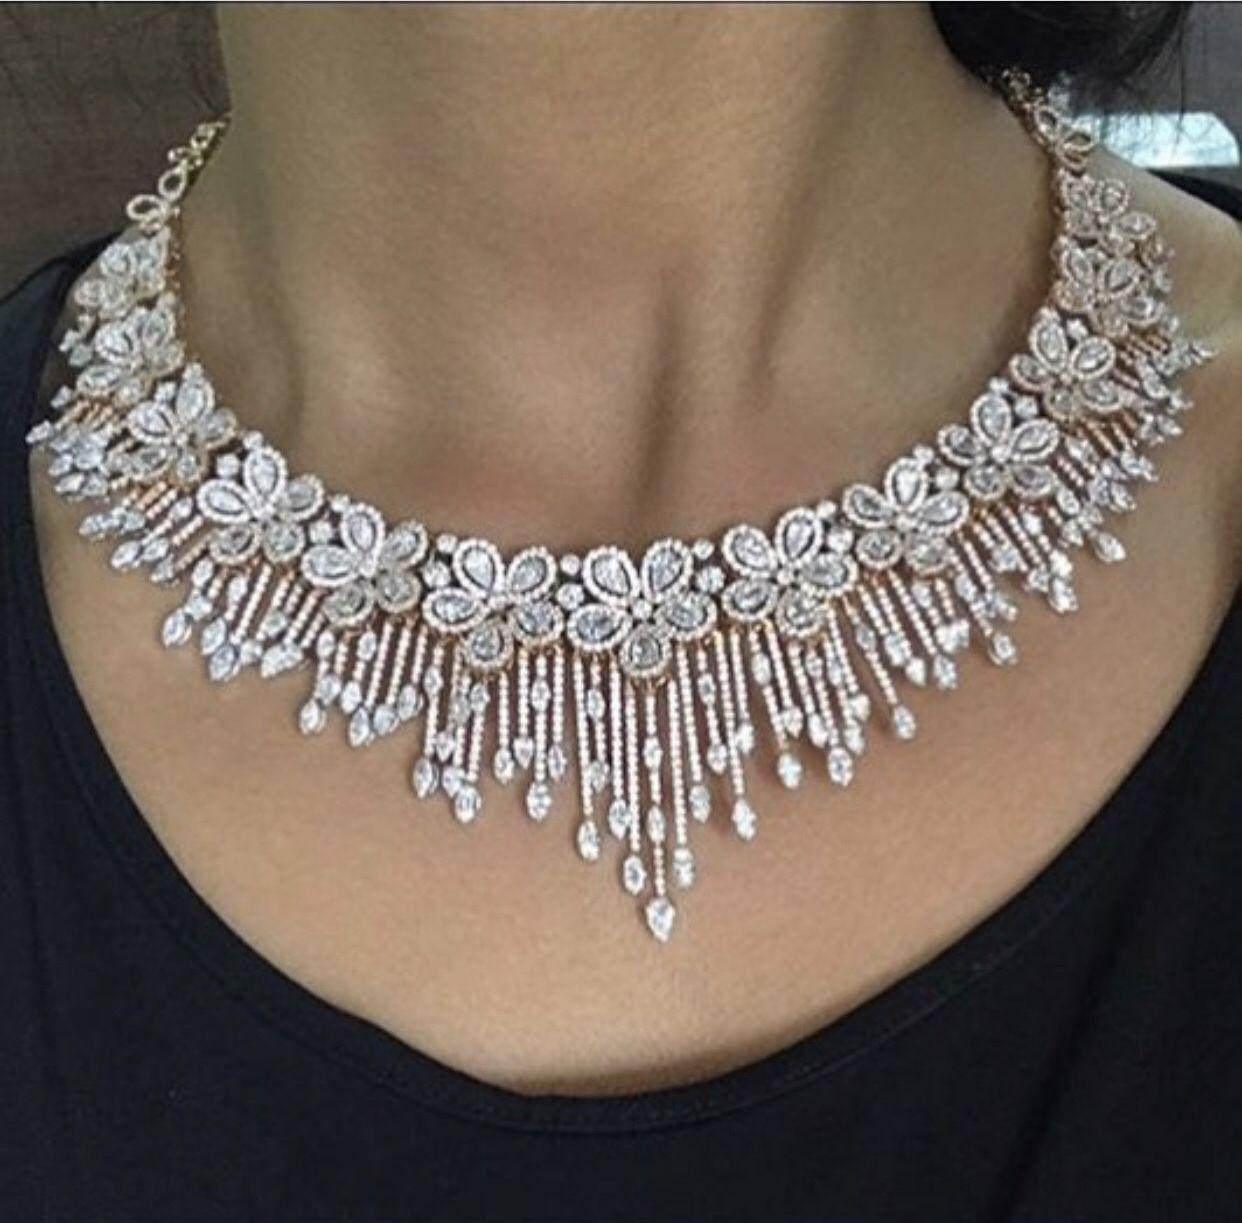 Engagement Rings Hobart: Diamond Necklace Designs By Manoj Kadel On Diamond